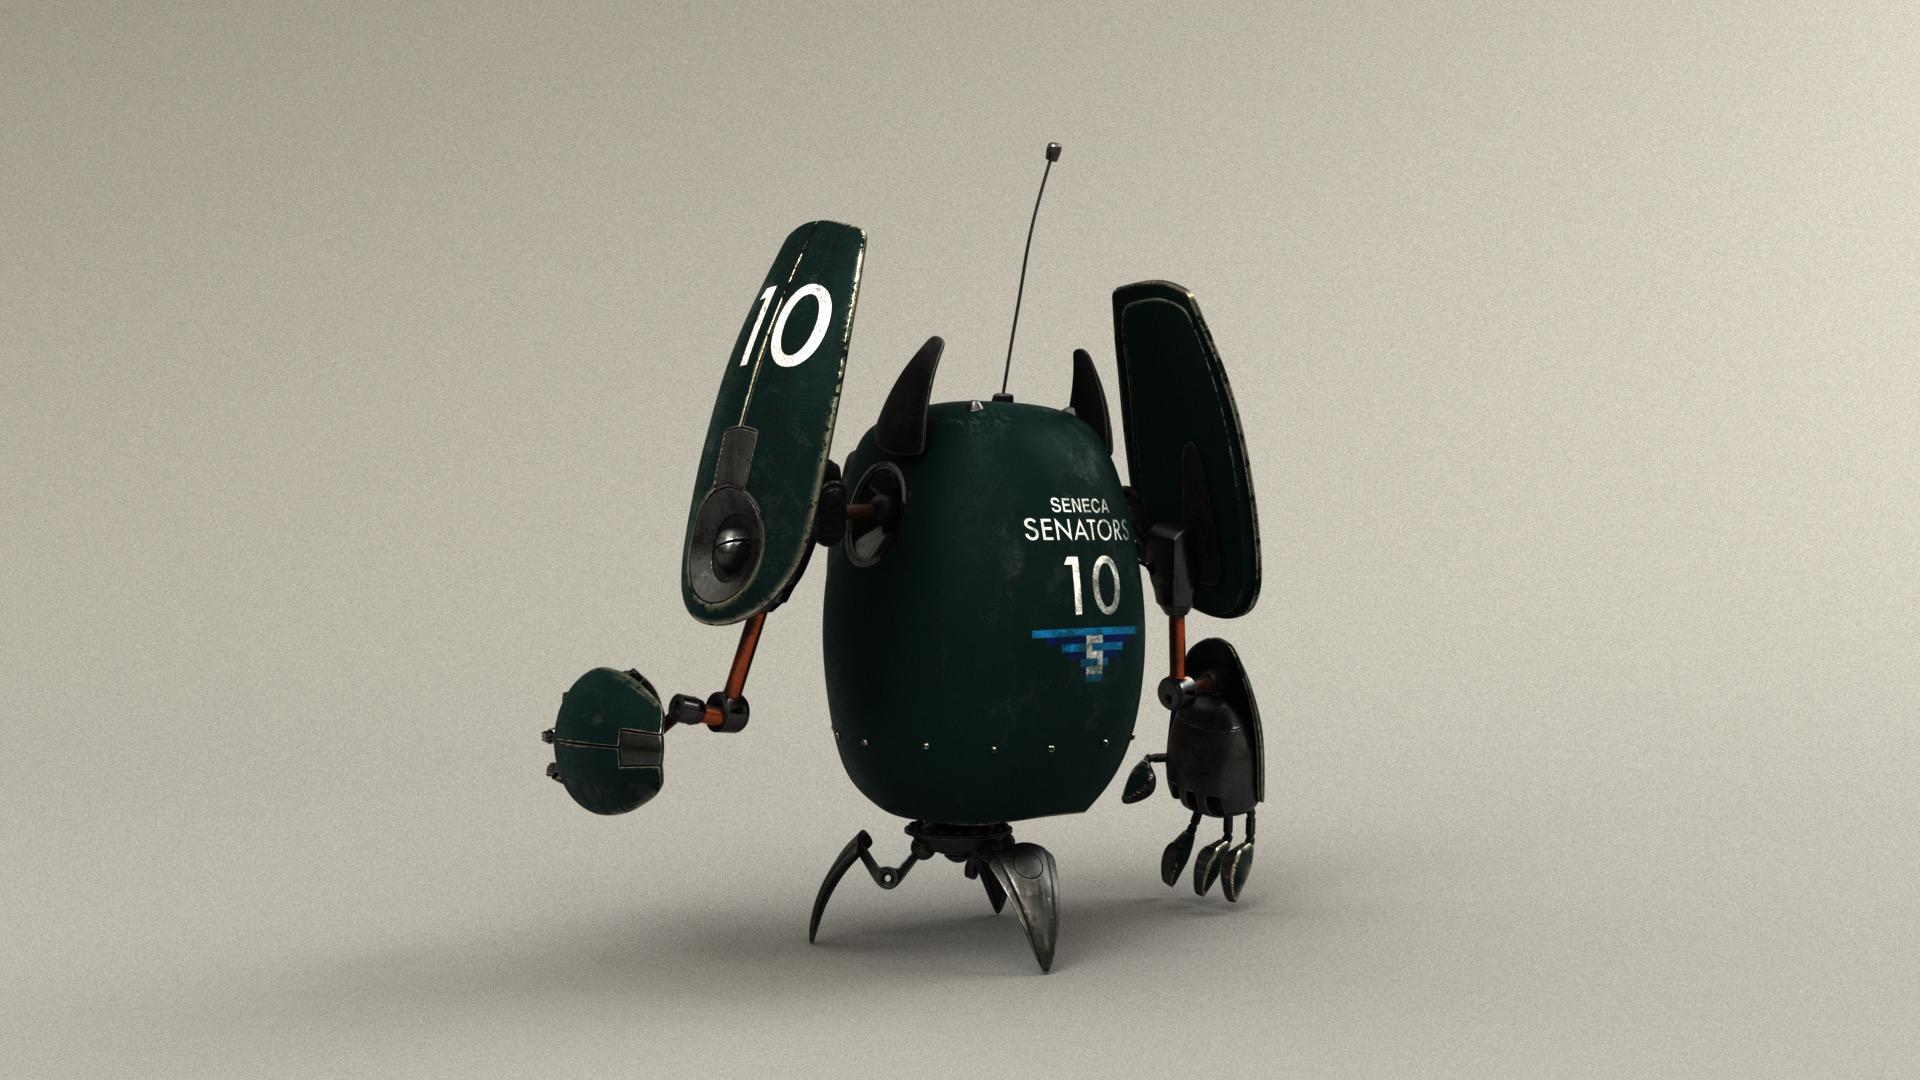 Figure 19: Sports fan robot wearing the colors of the in-world team, the Seneca Senators.